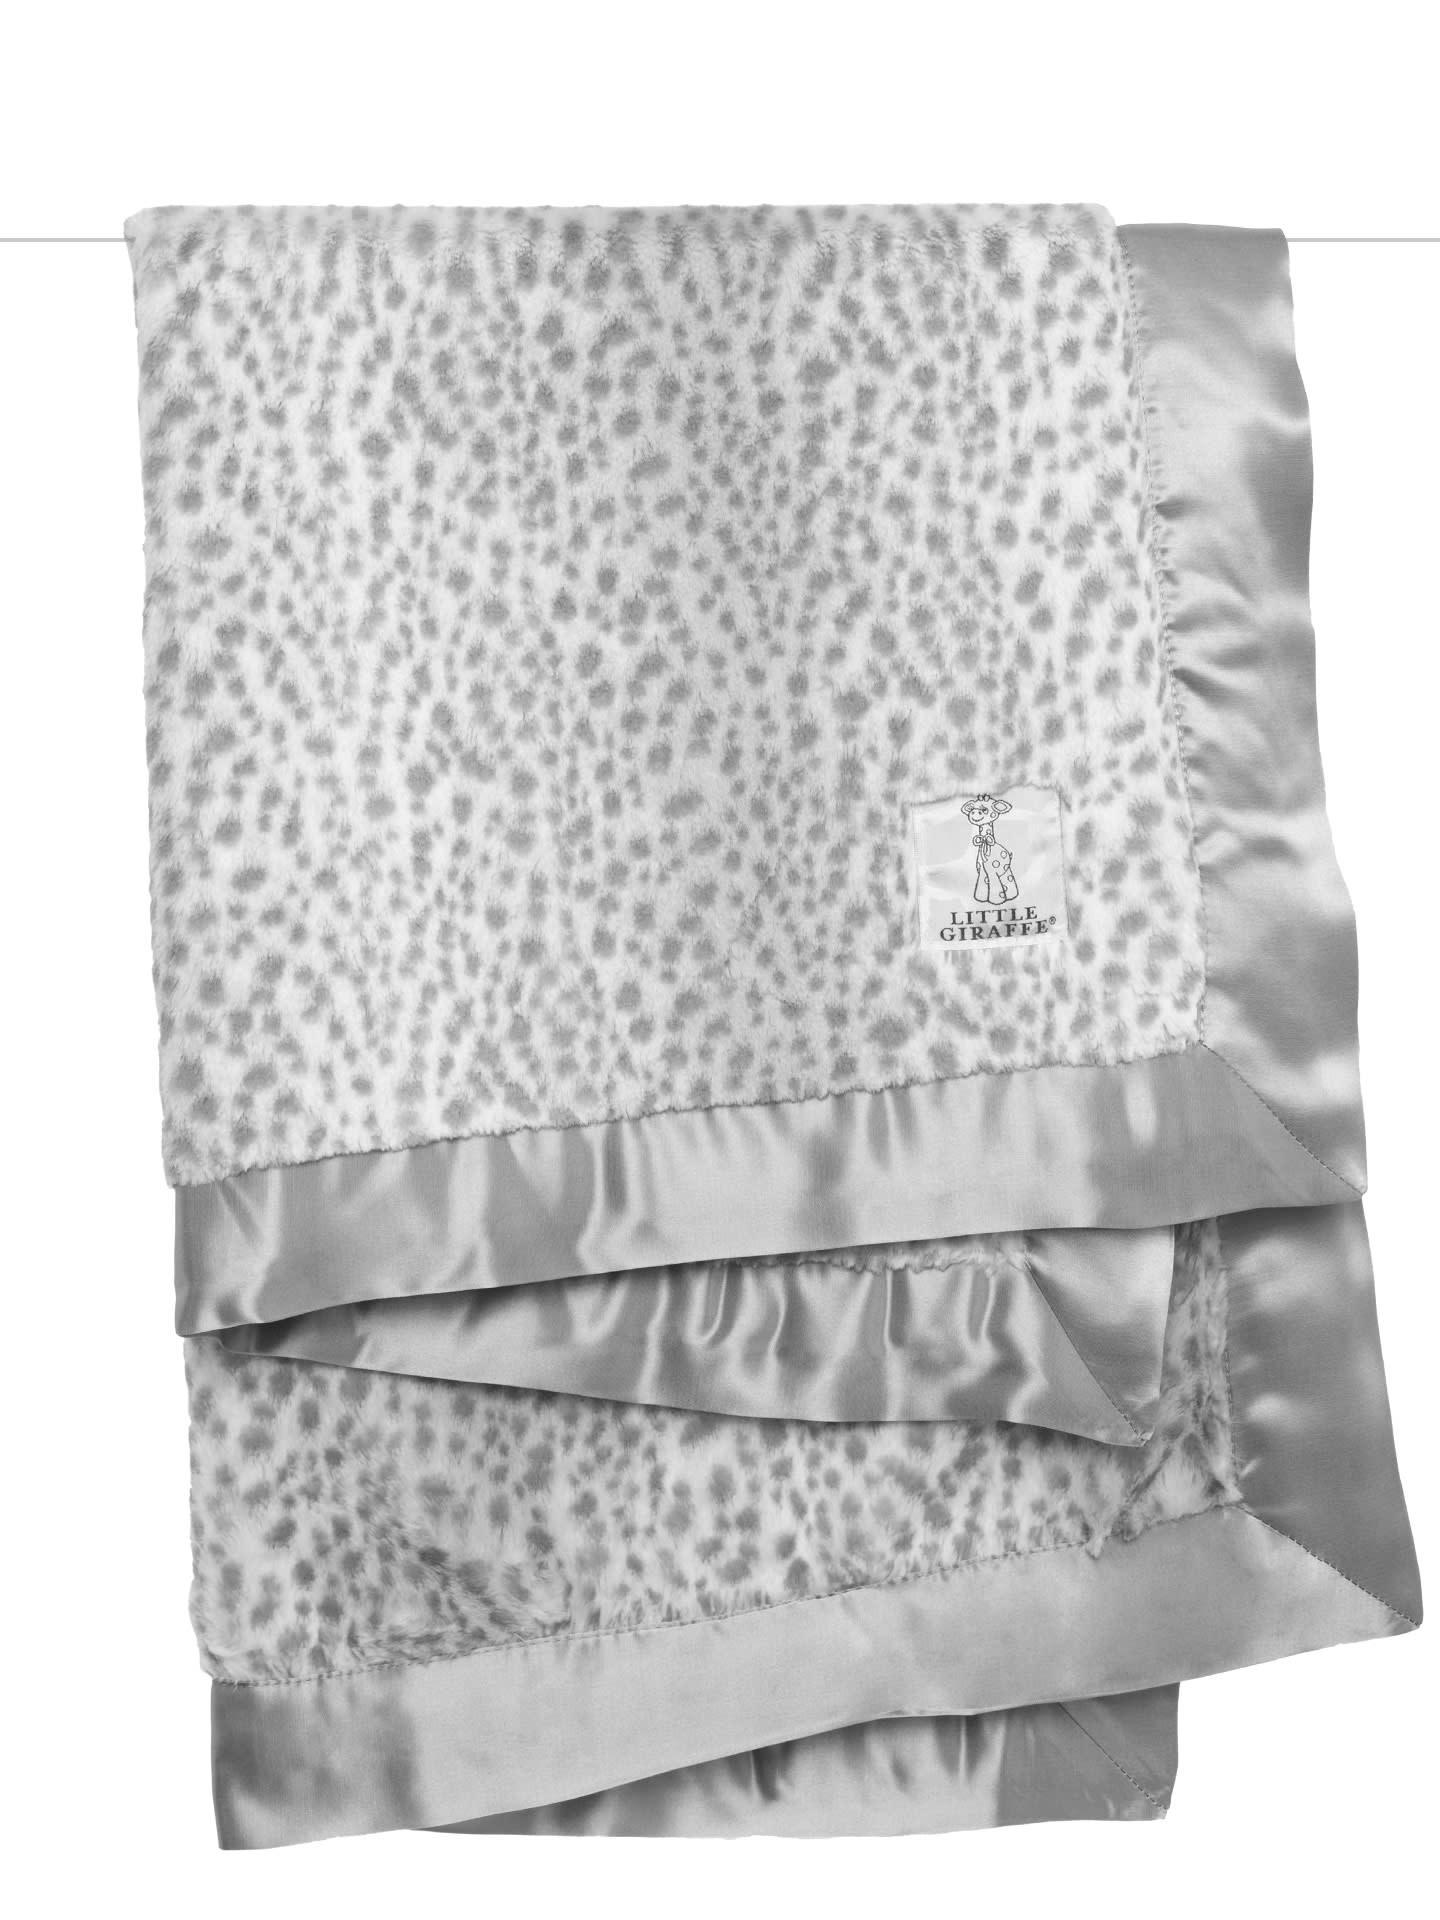 LG Luxe Blanket Snow Leopard-2